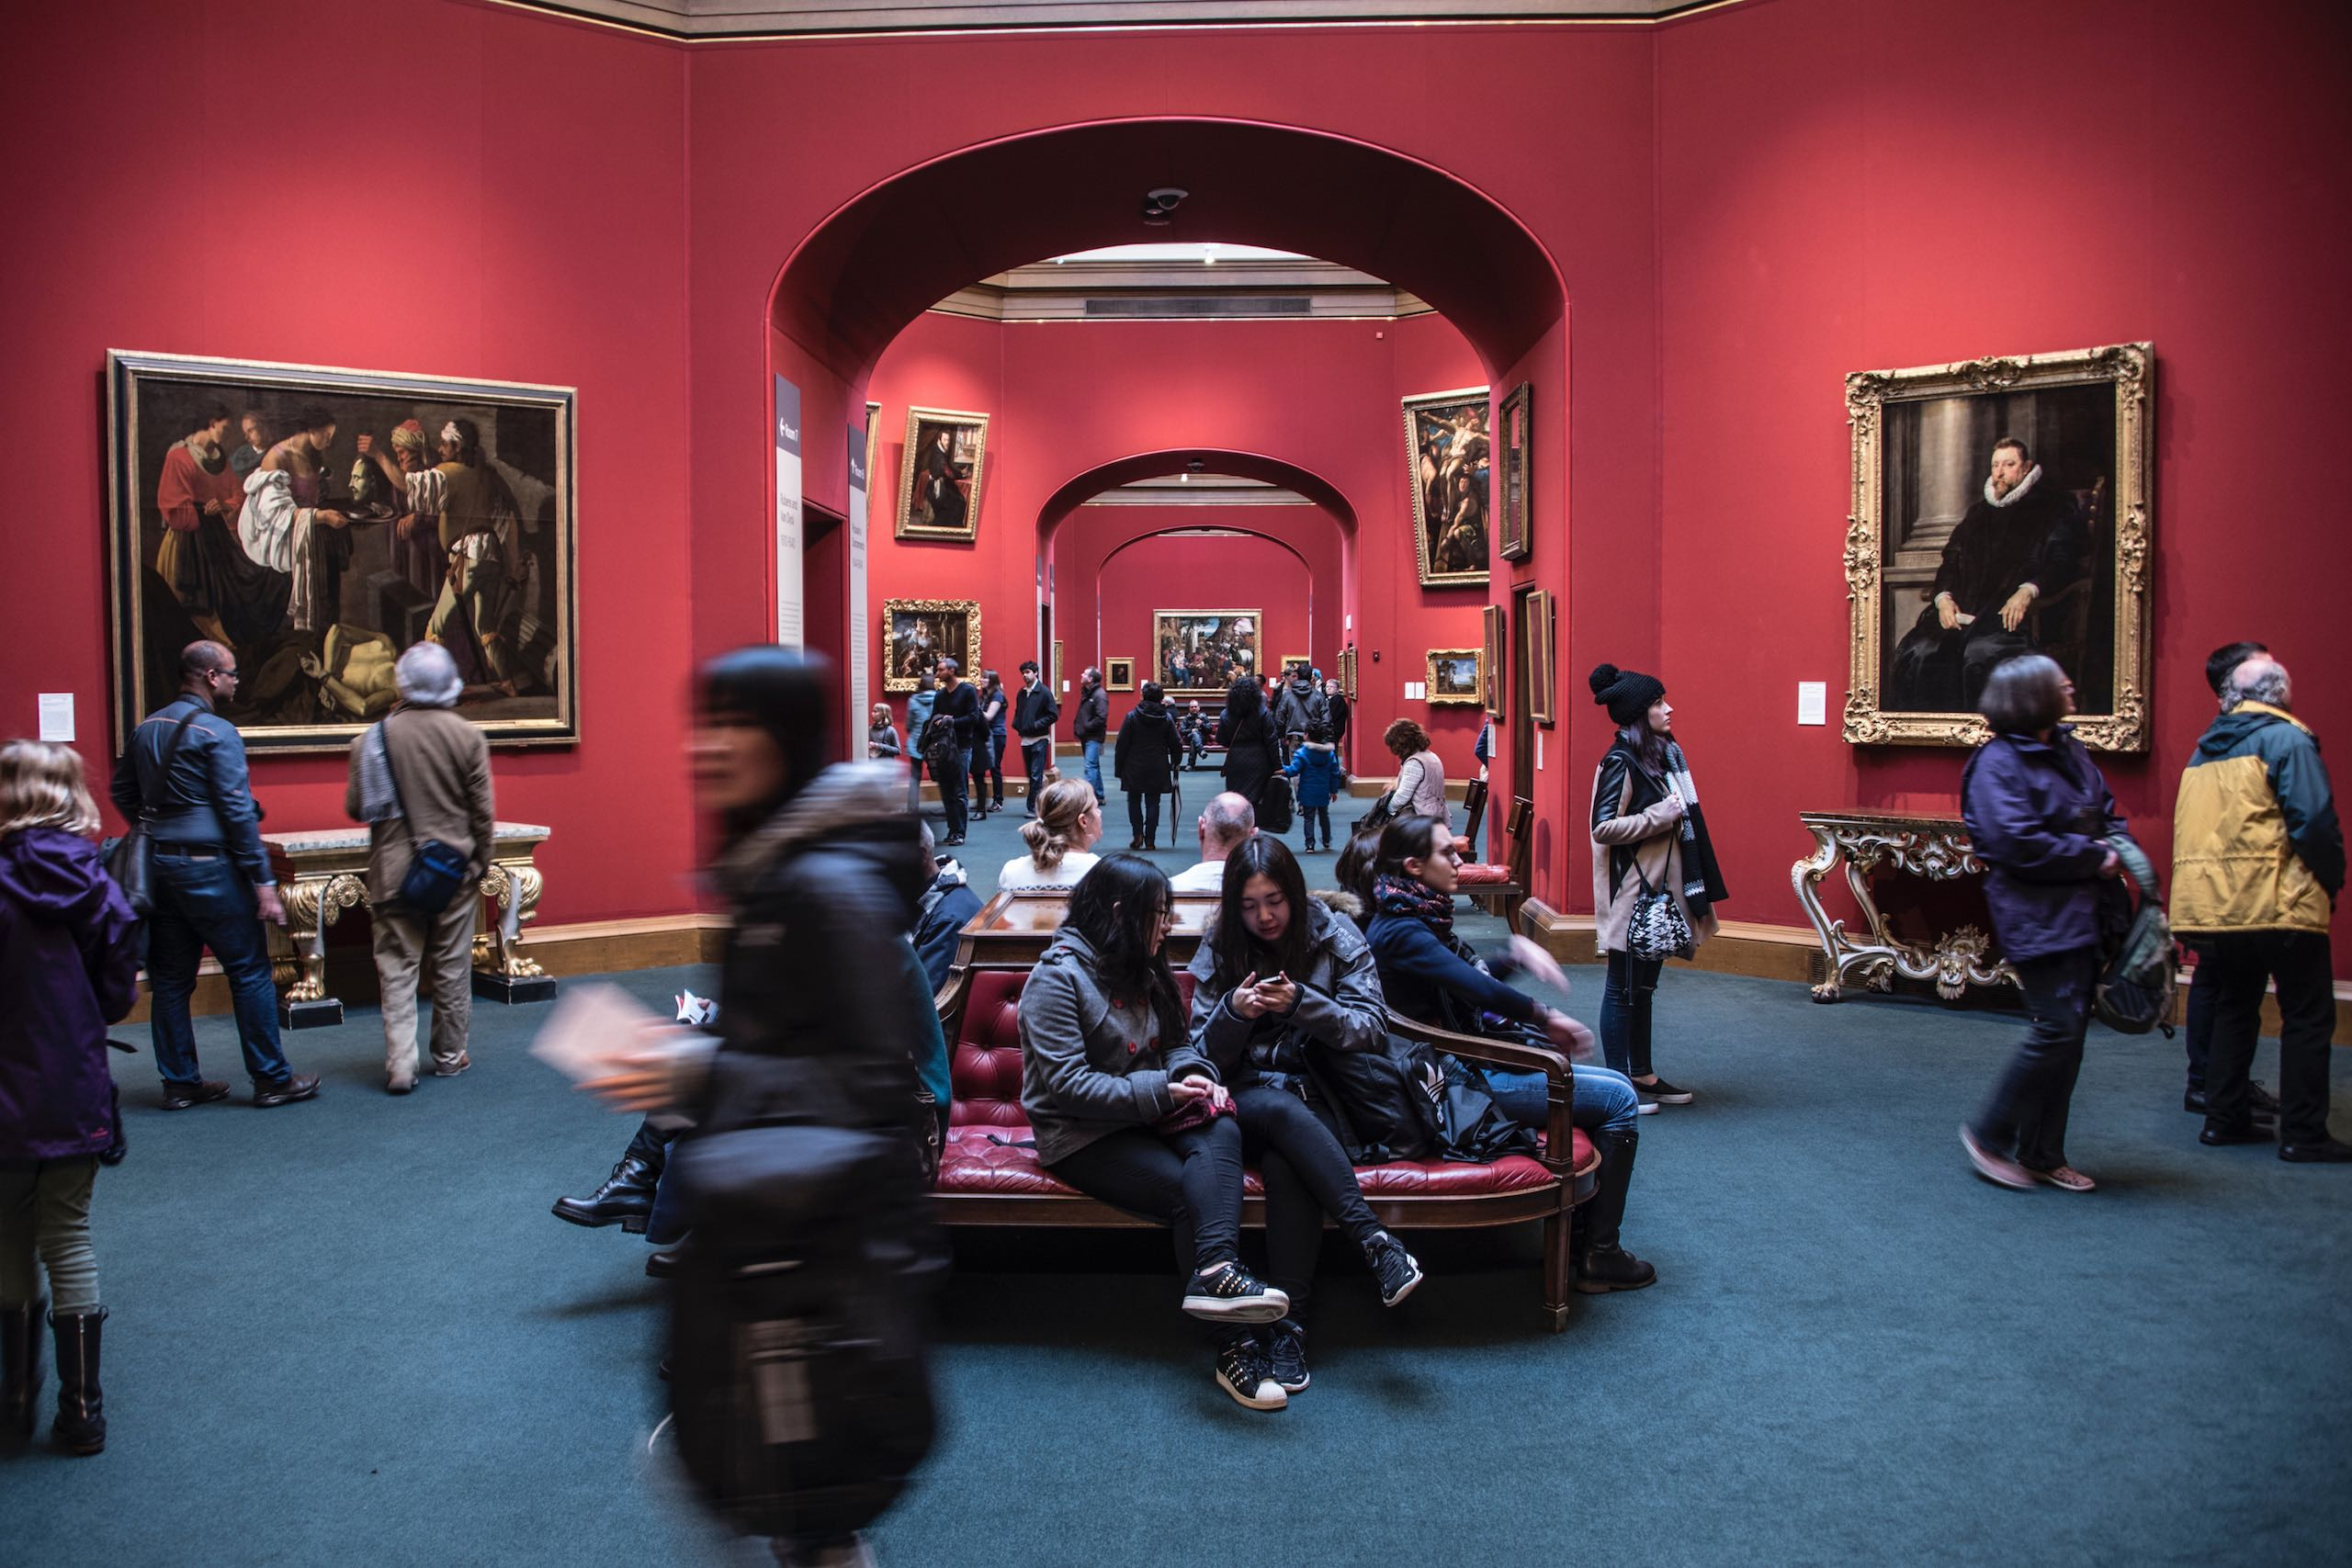 Scottish National Gallery Scotland